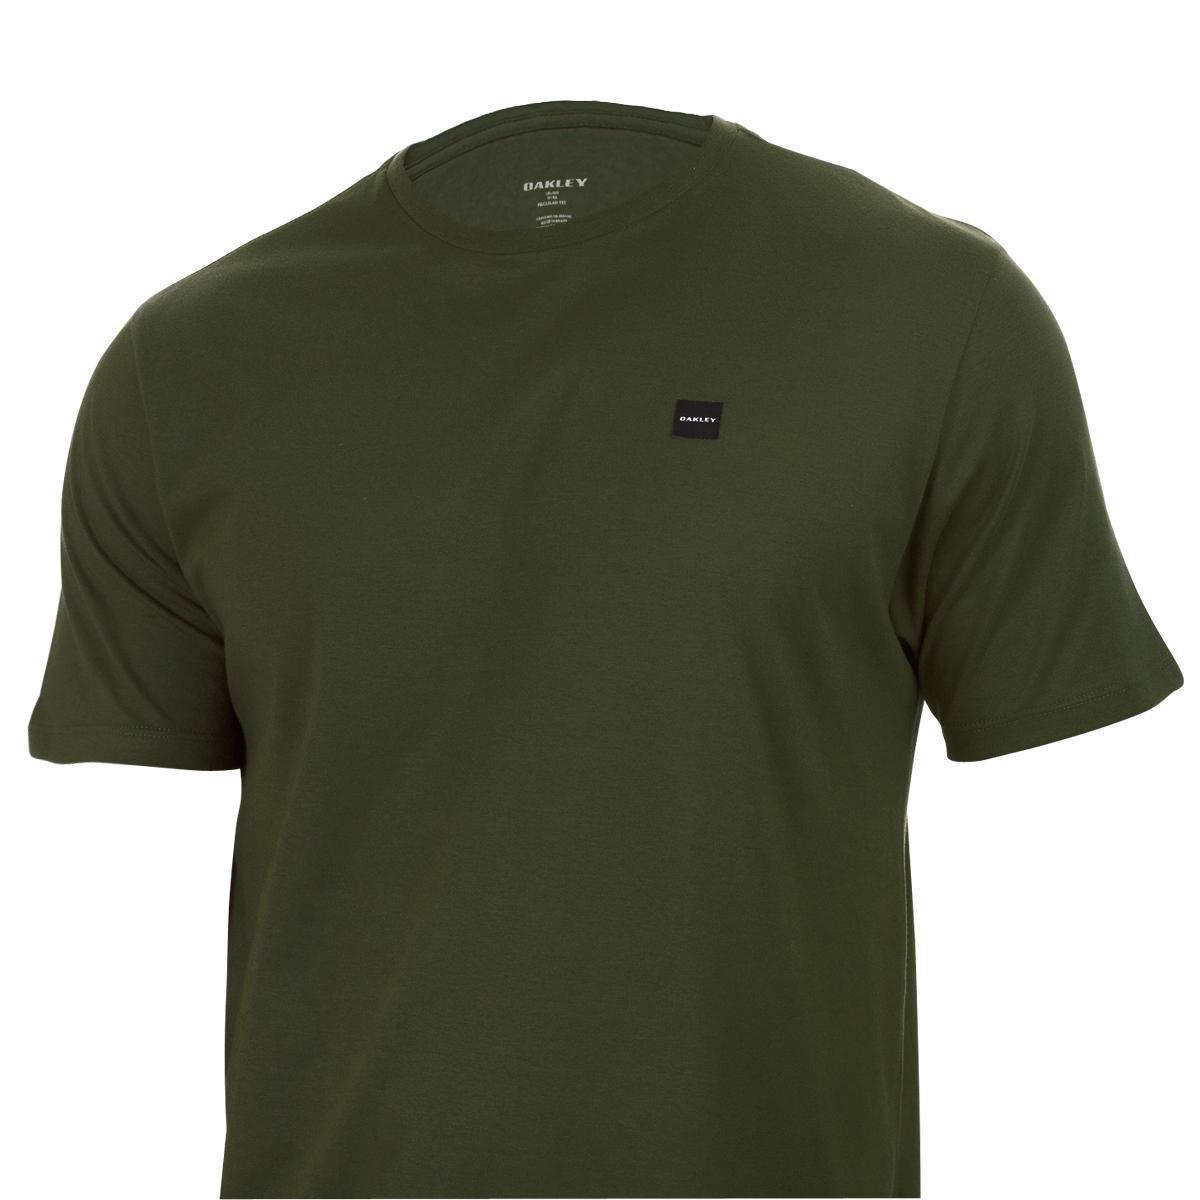 Camiseta Oakley Patch 2.0 Dark Brush Masculina - Verde Militar